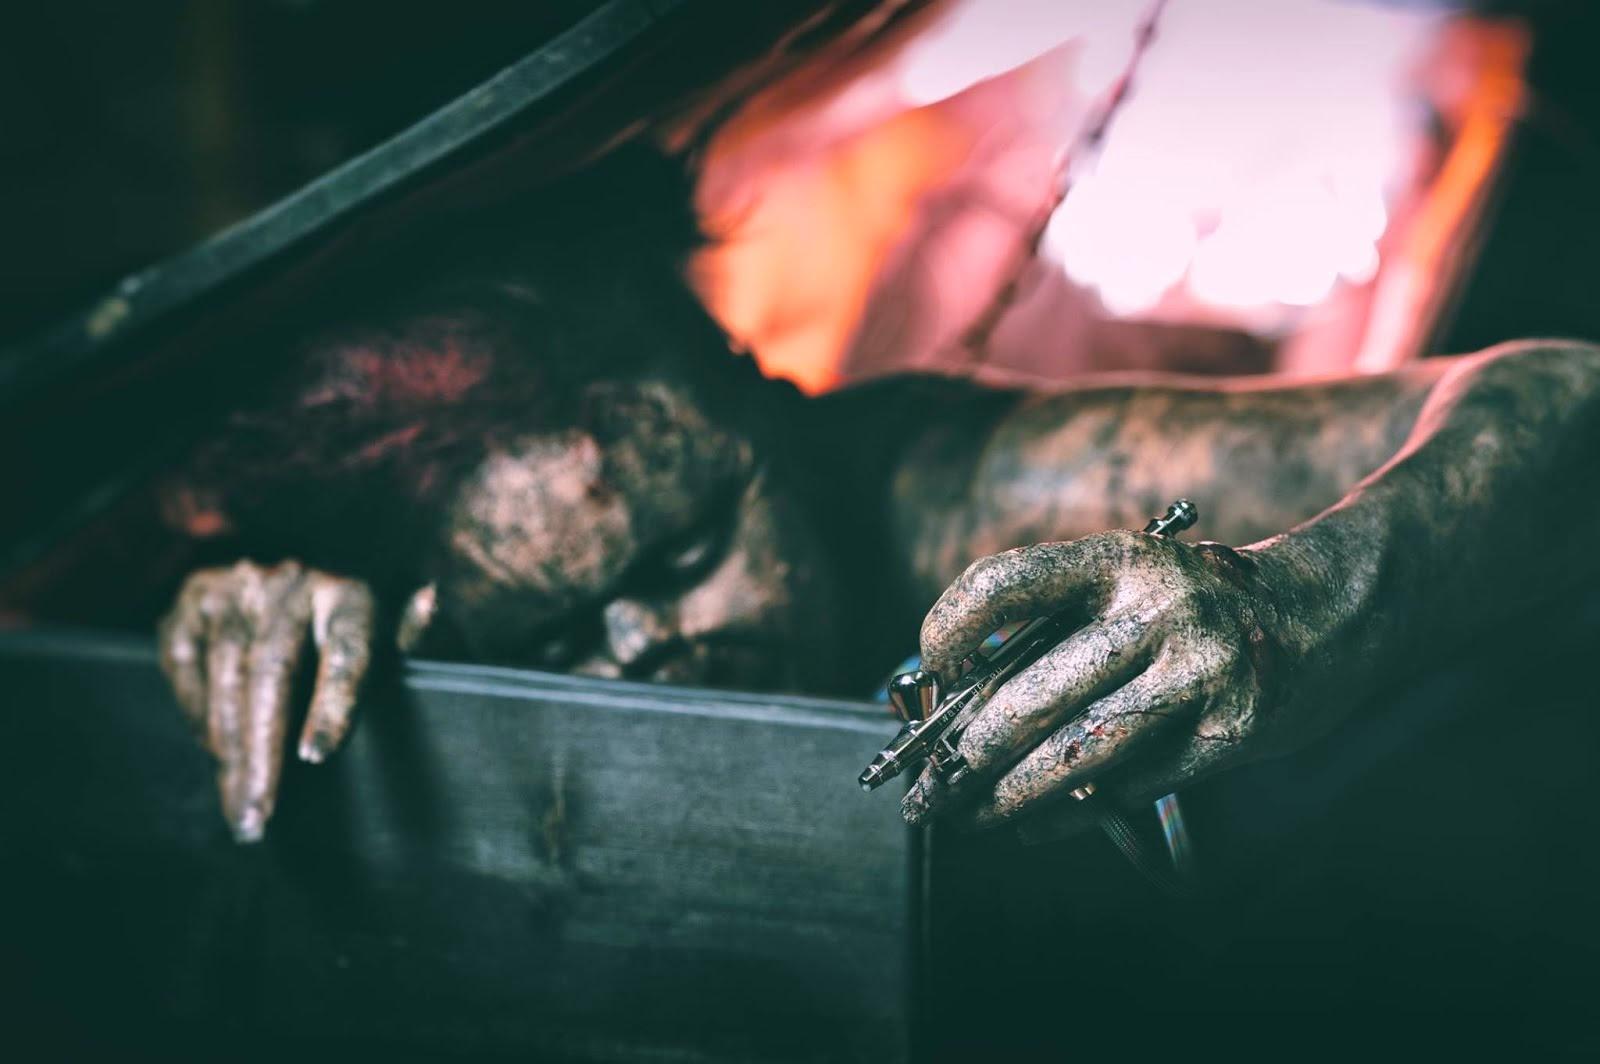 Satu Tabell. Zombie/efekti-maskeeraus: Ari Savonen.